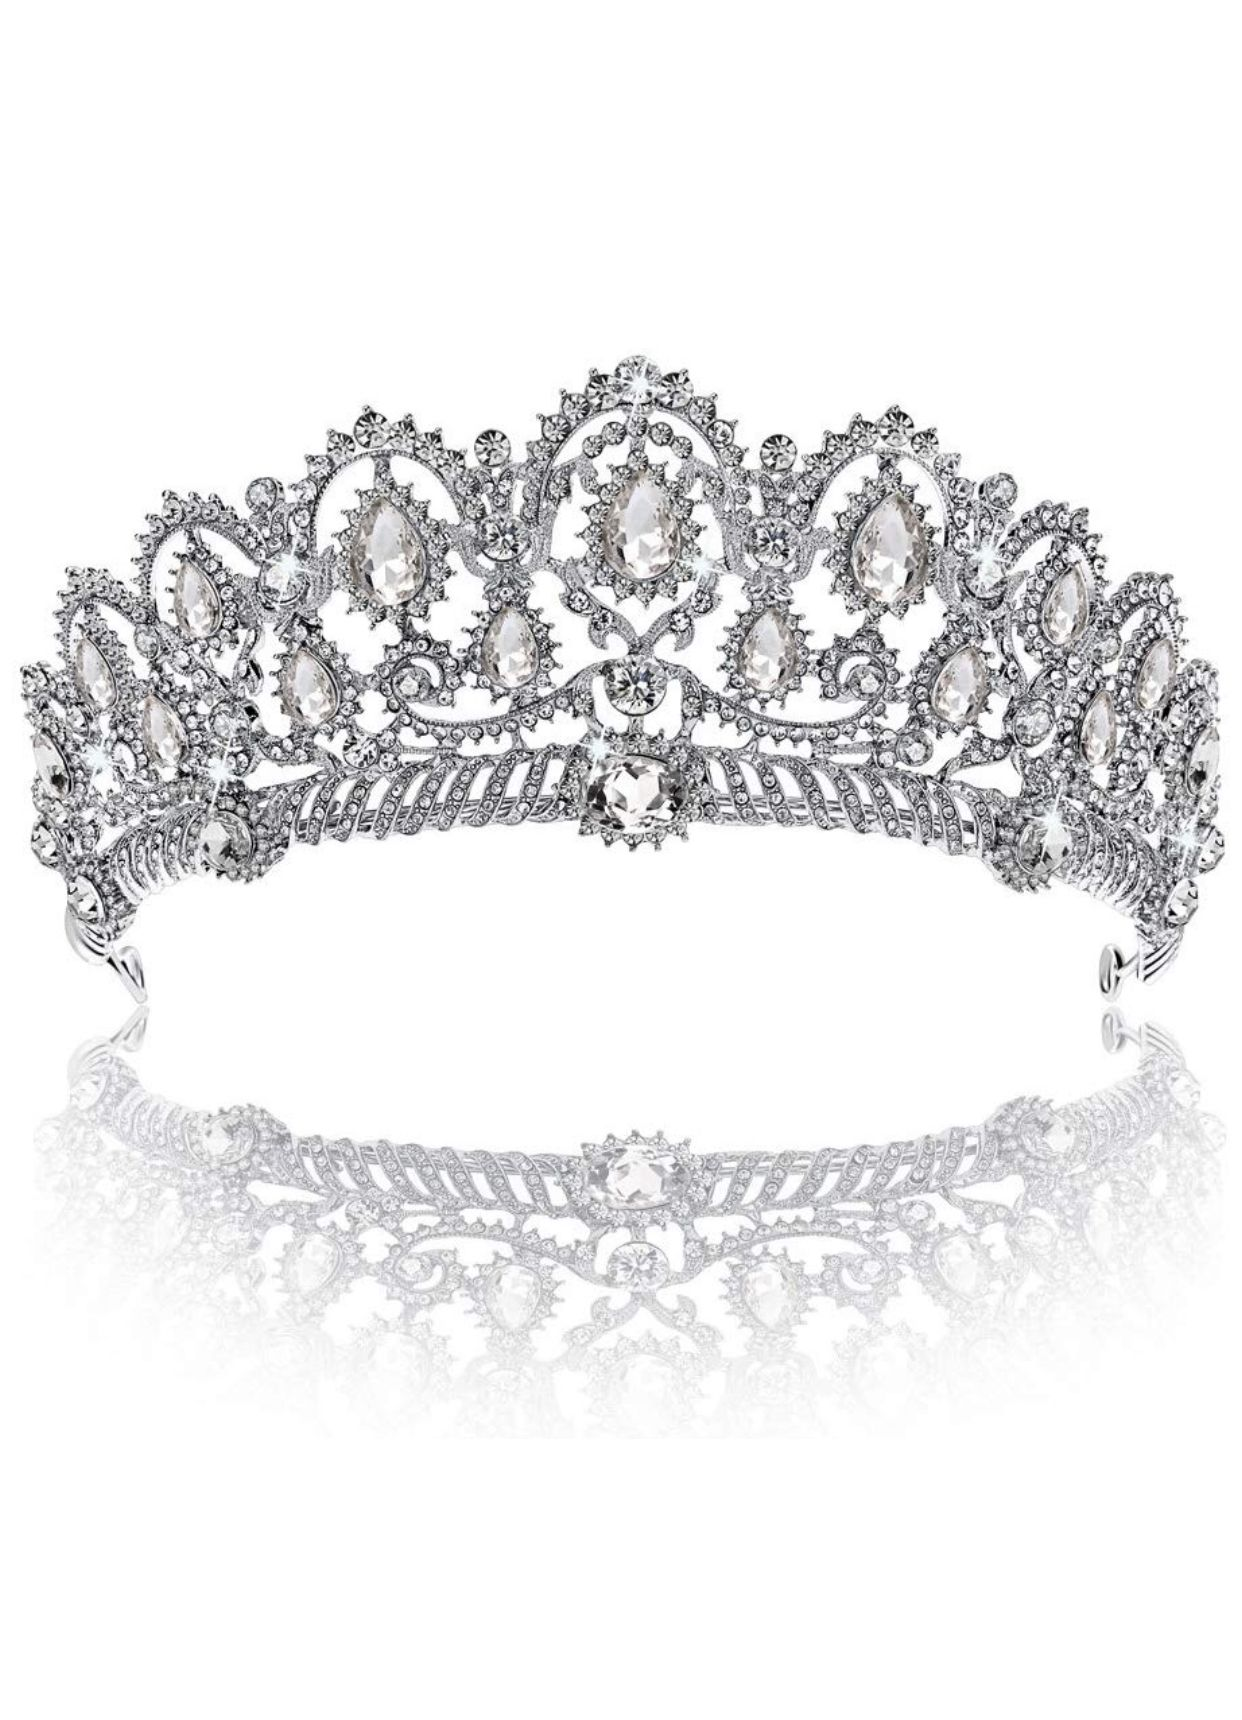 Pin By Christina Lam On Wedding Items Crystal Crown Wedding Wedding Item Queens Tiaras